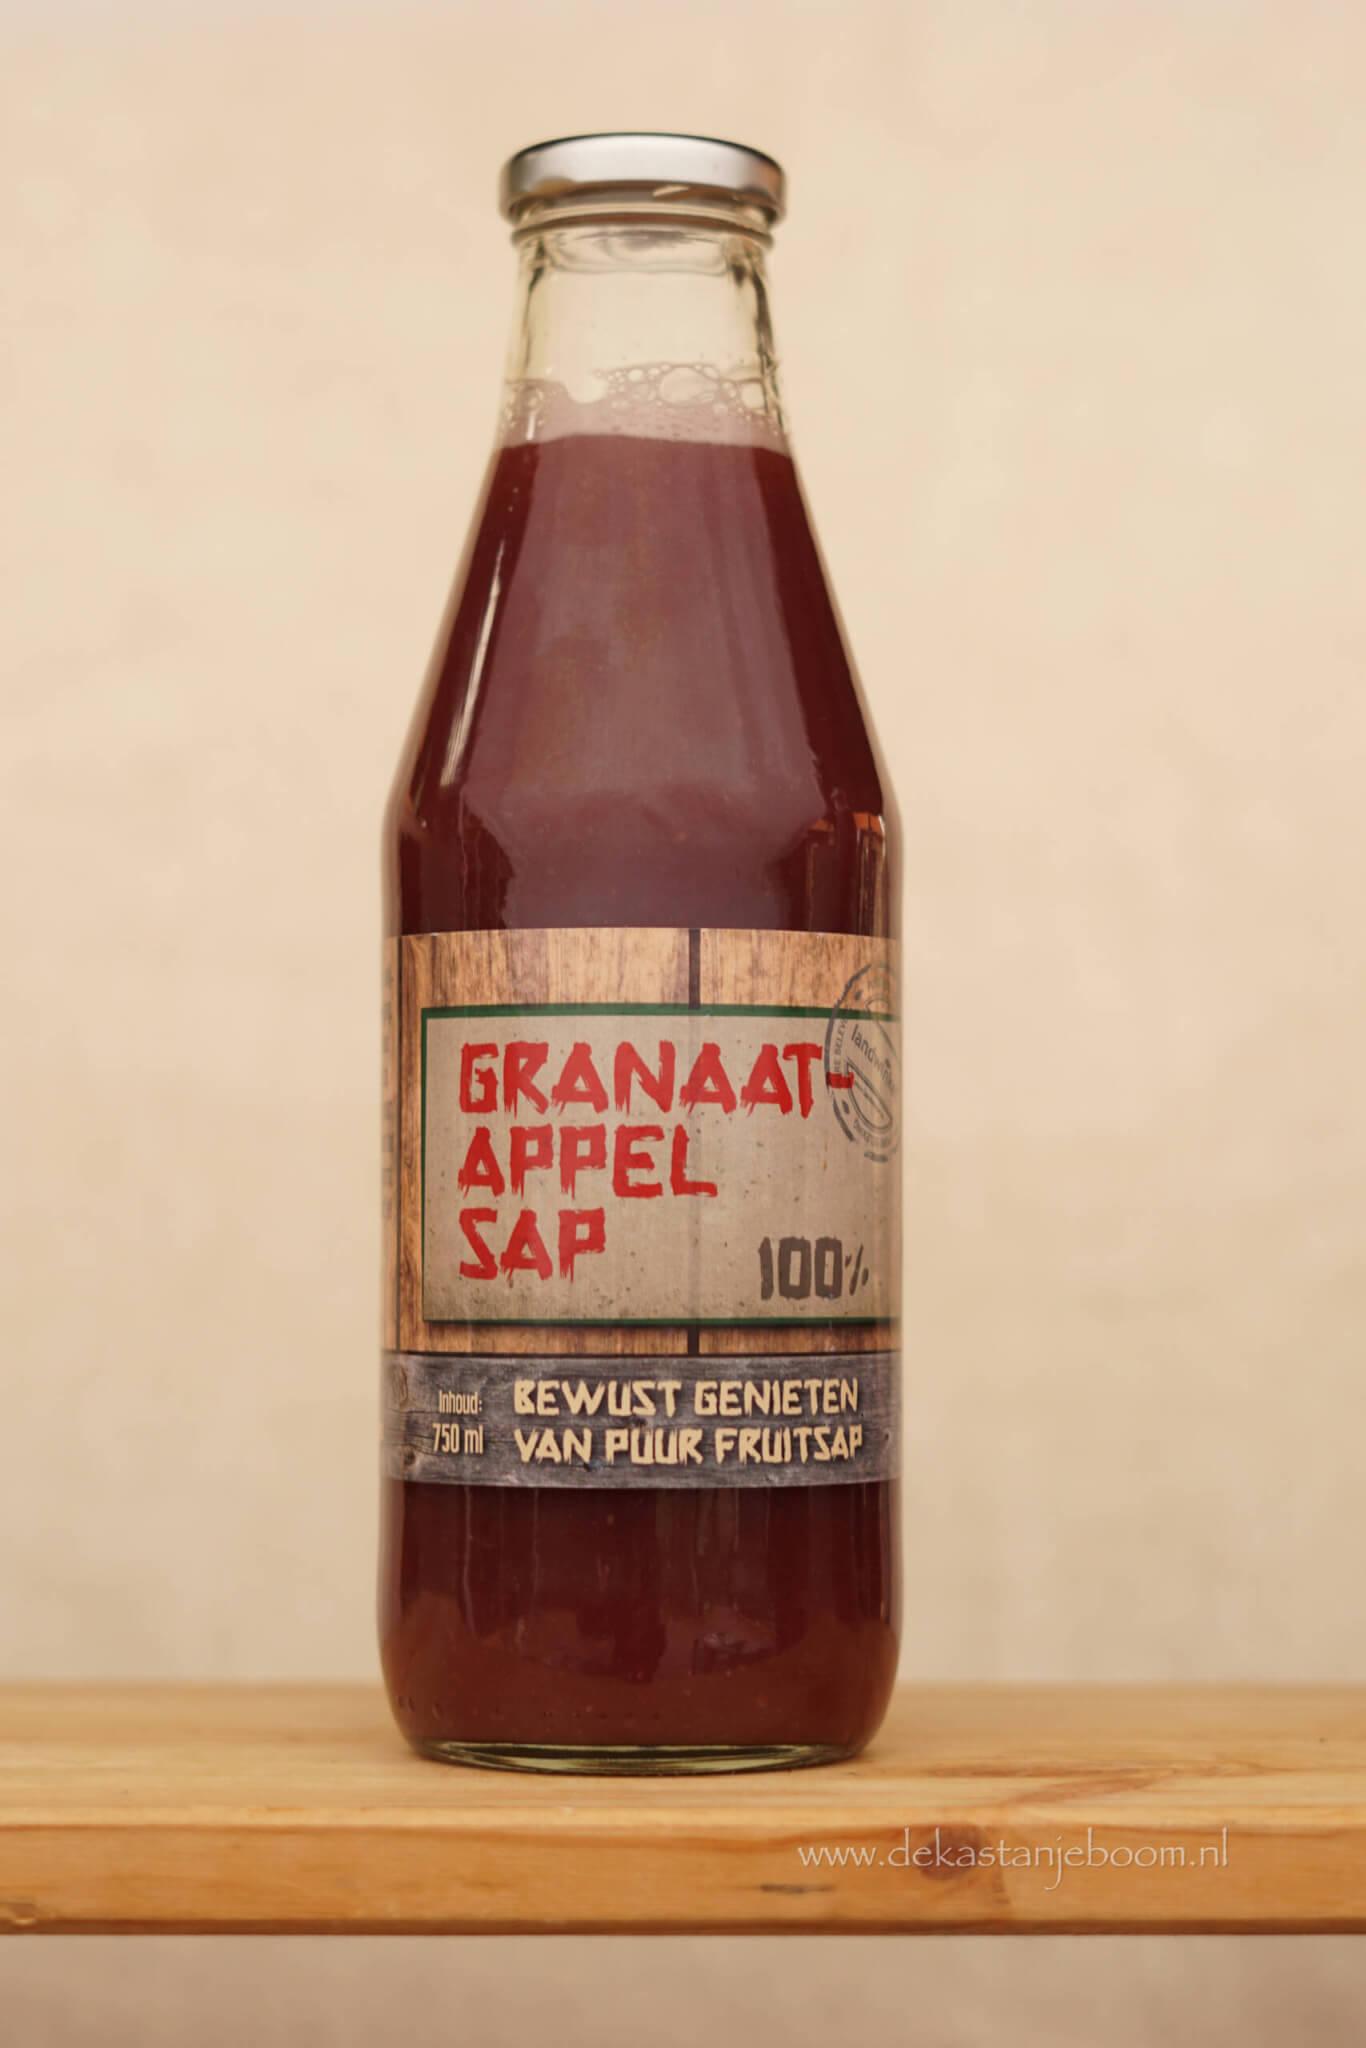 Granaatappel sap 100%